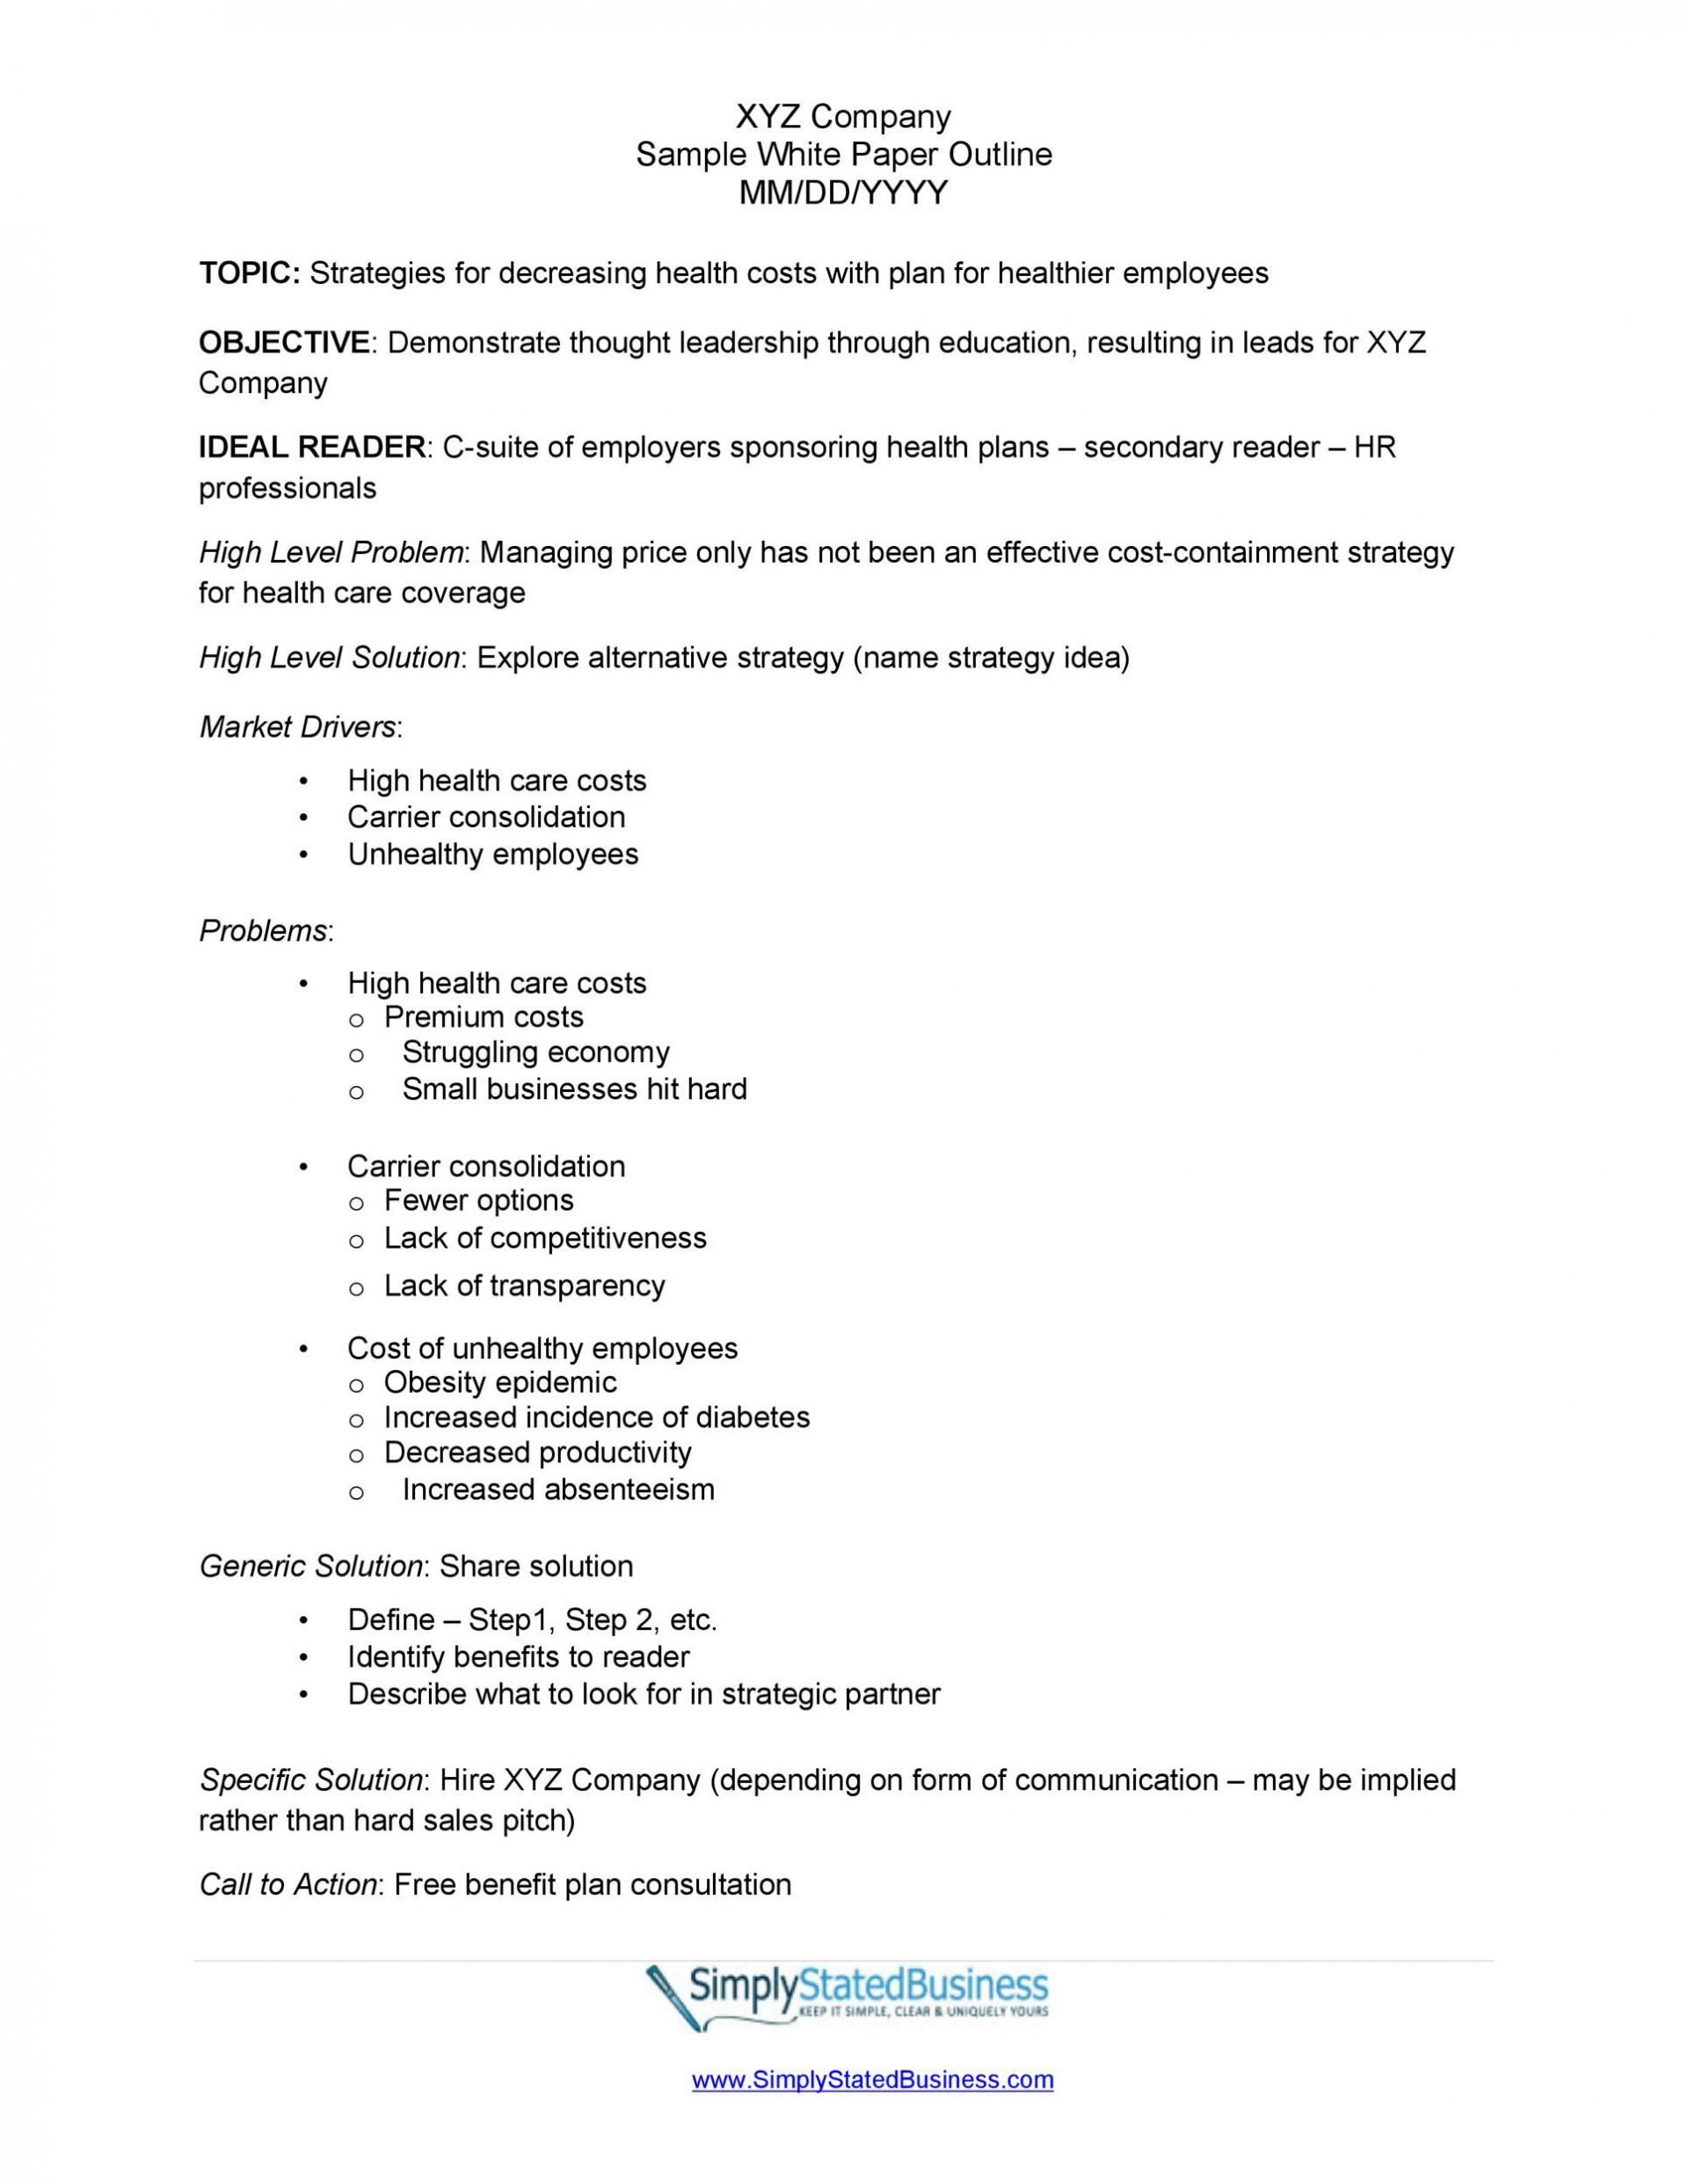 006 Remarkable White Paper Outline Sample Concept 1920